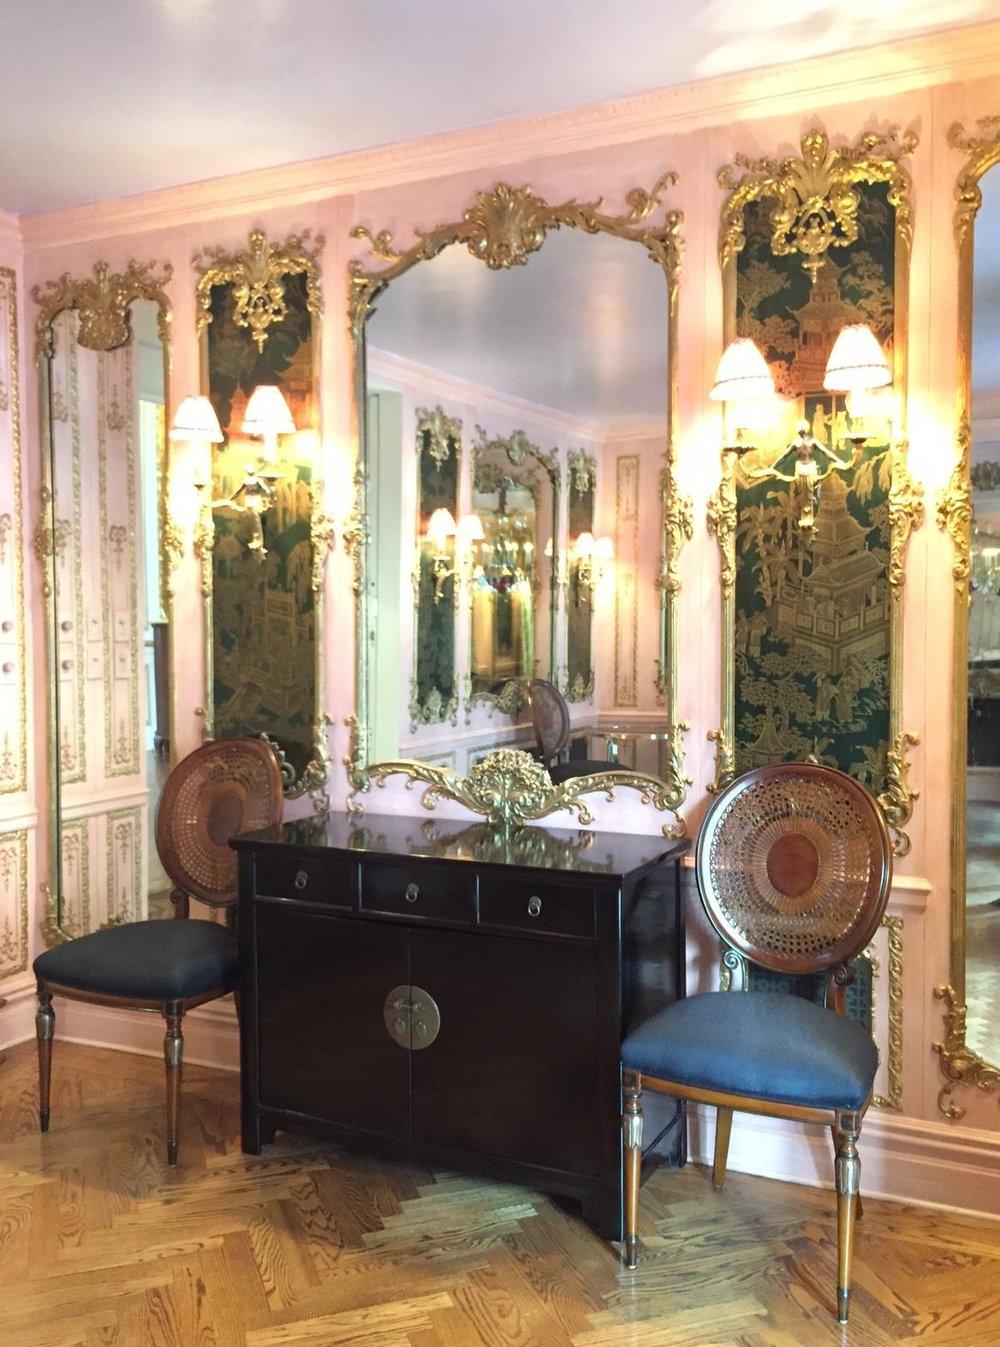 Interiors designed for Chinoiserie passage, New York City